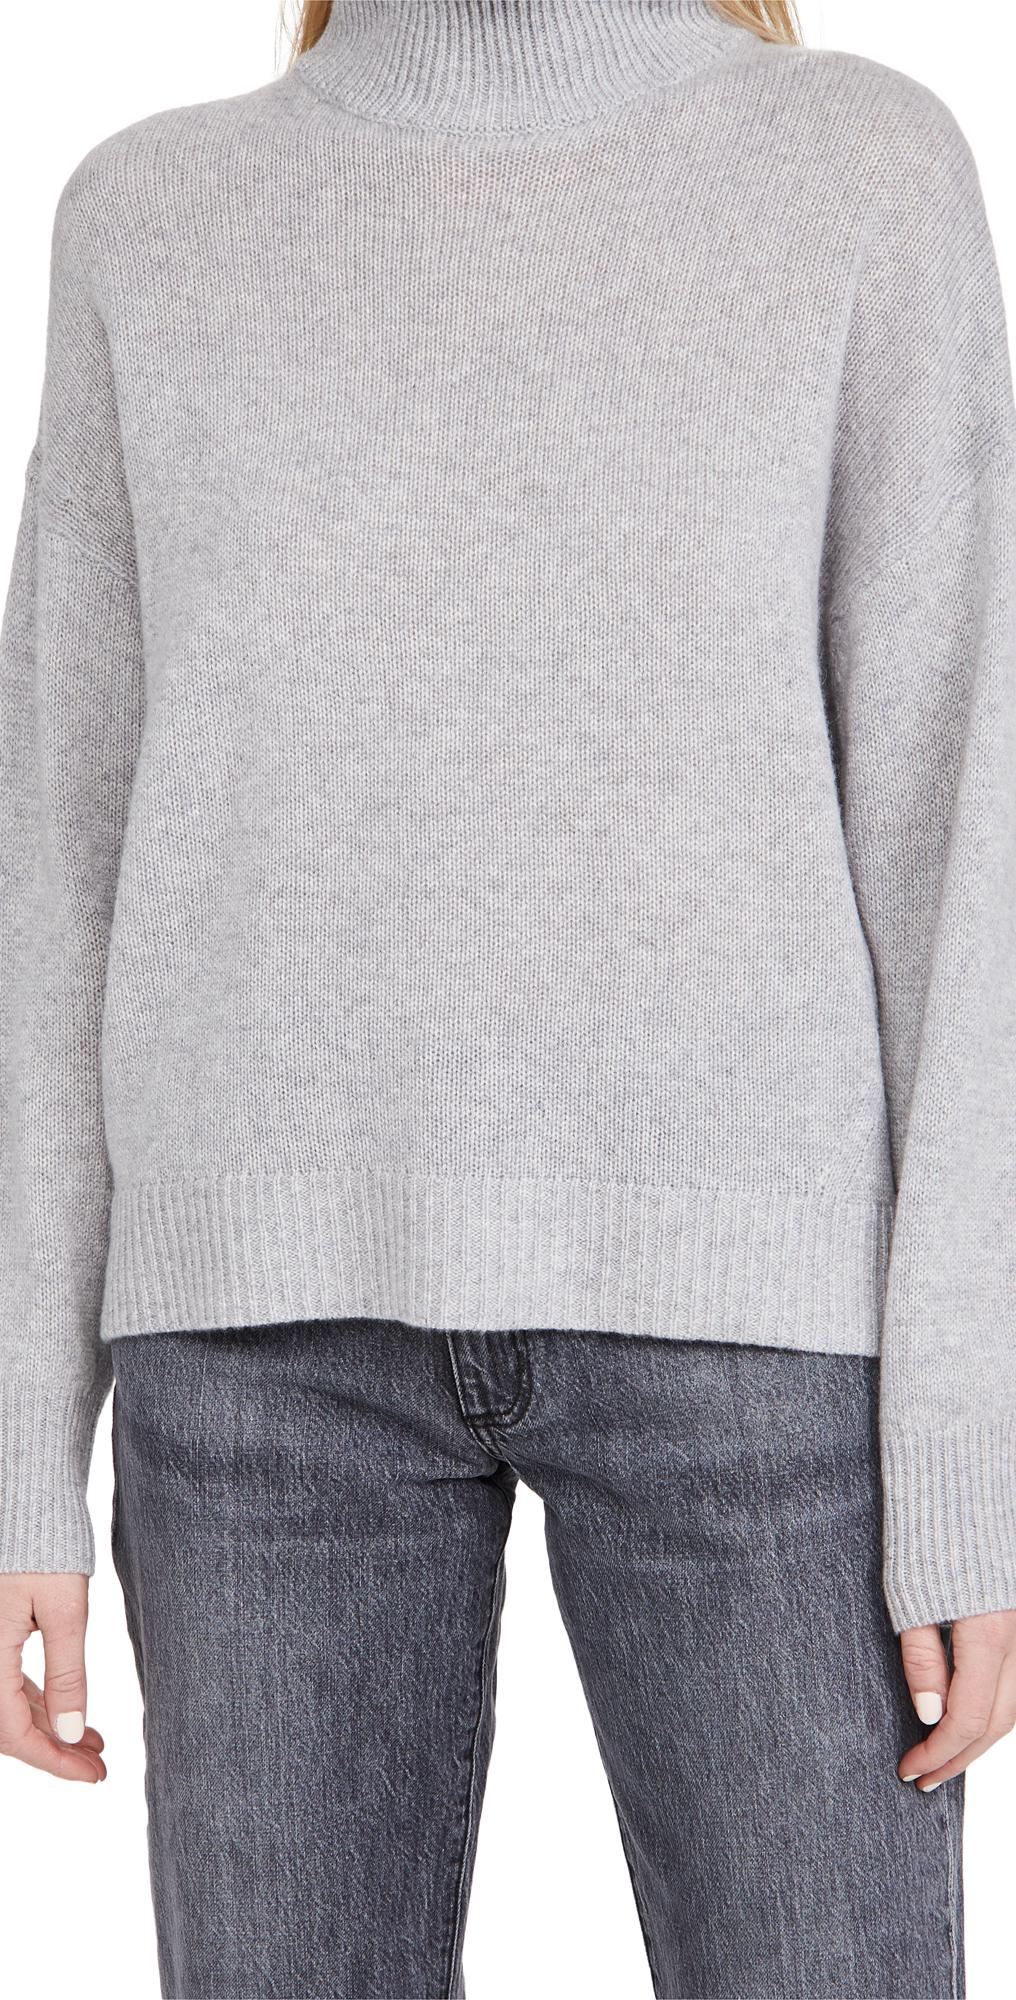 360 SWEATER Leia Cashmere Sweater